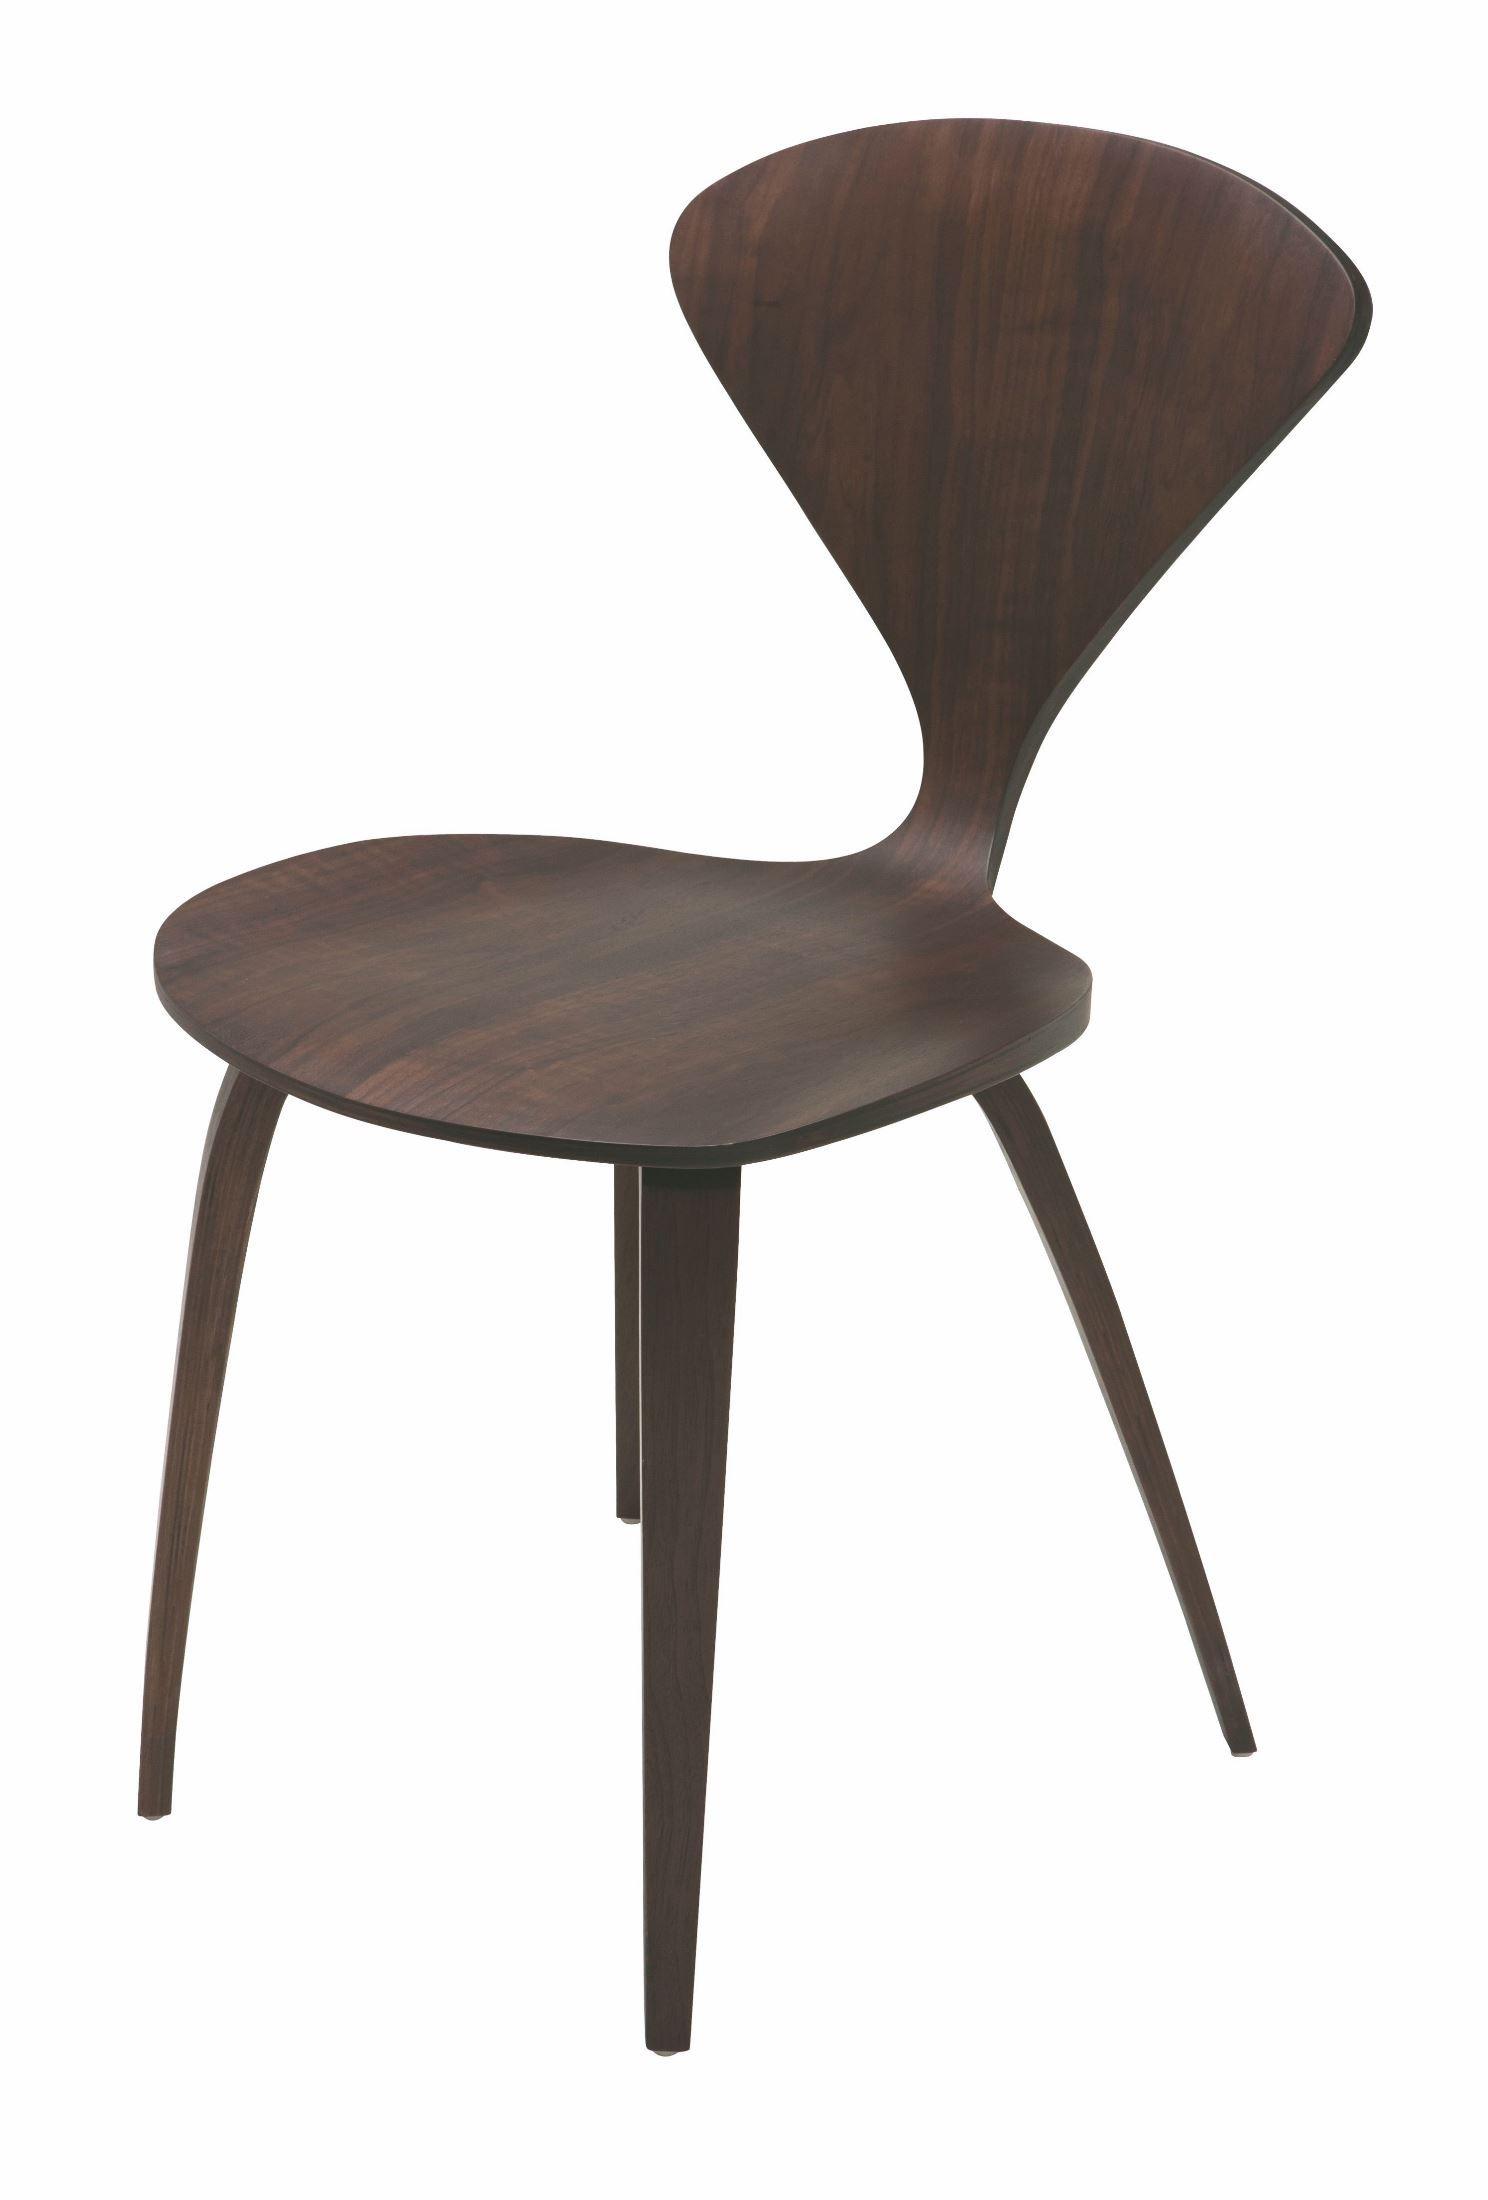 Satine dark walnut wood dining chair hgem358 nuevo for Dining chairs dark wood